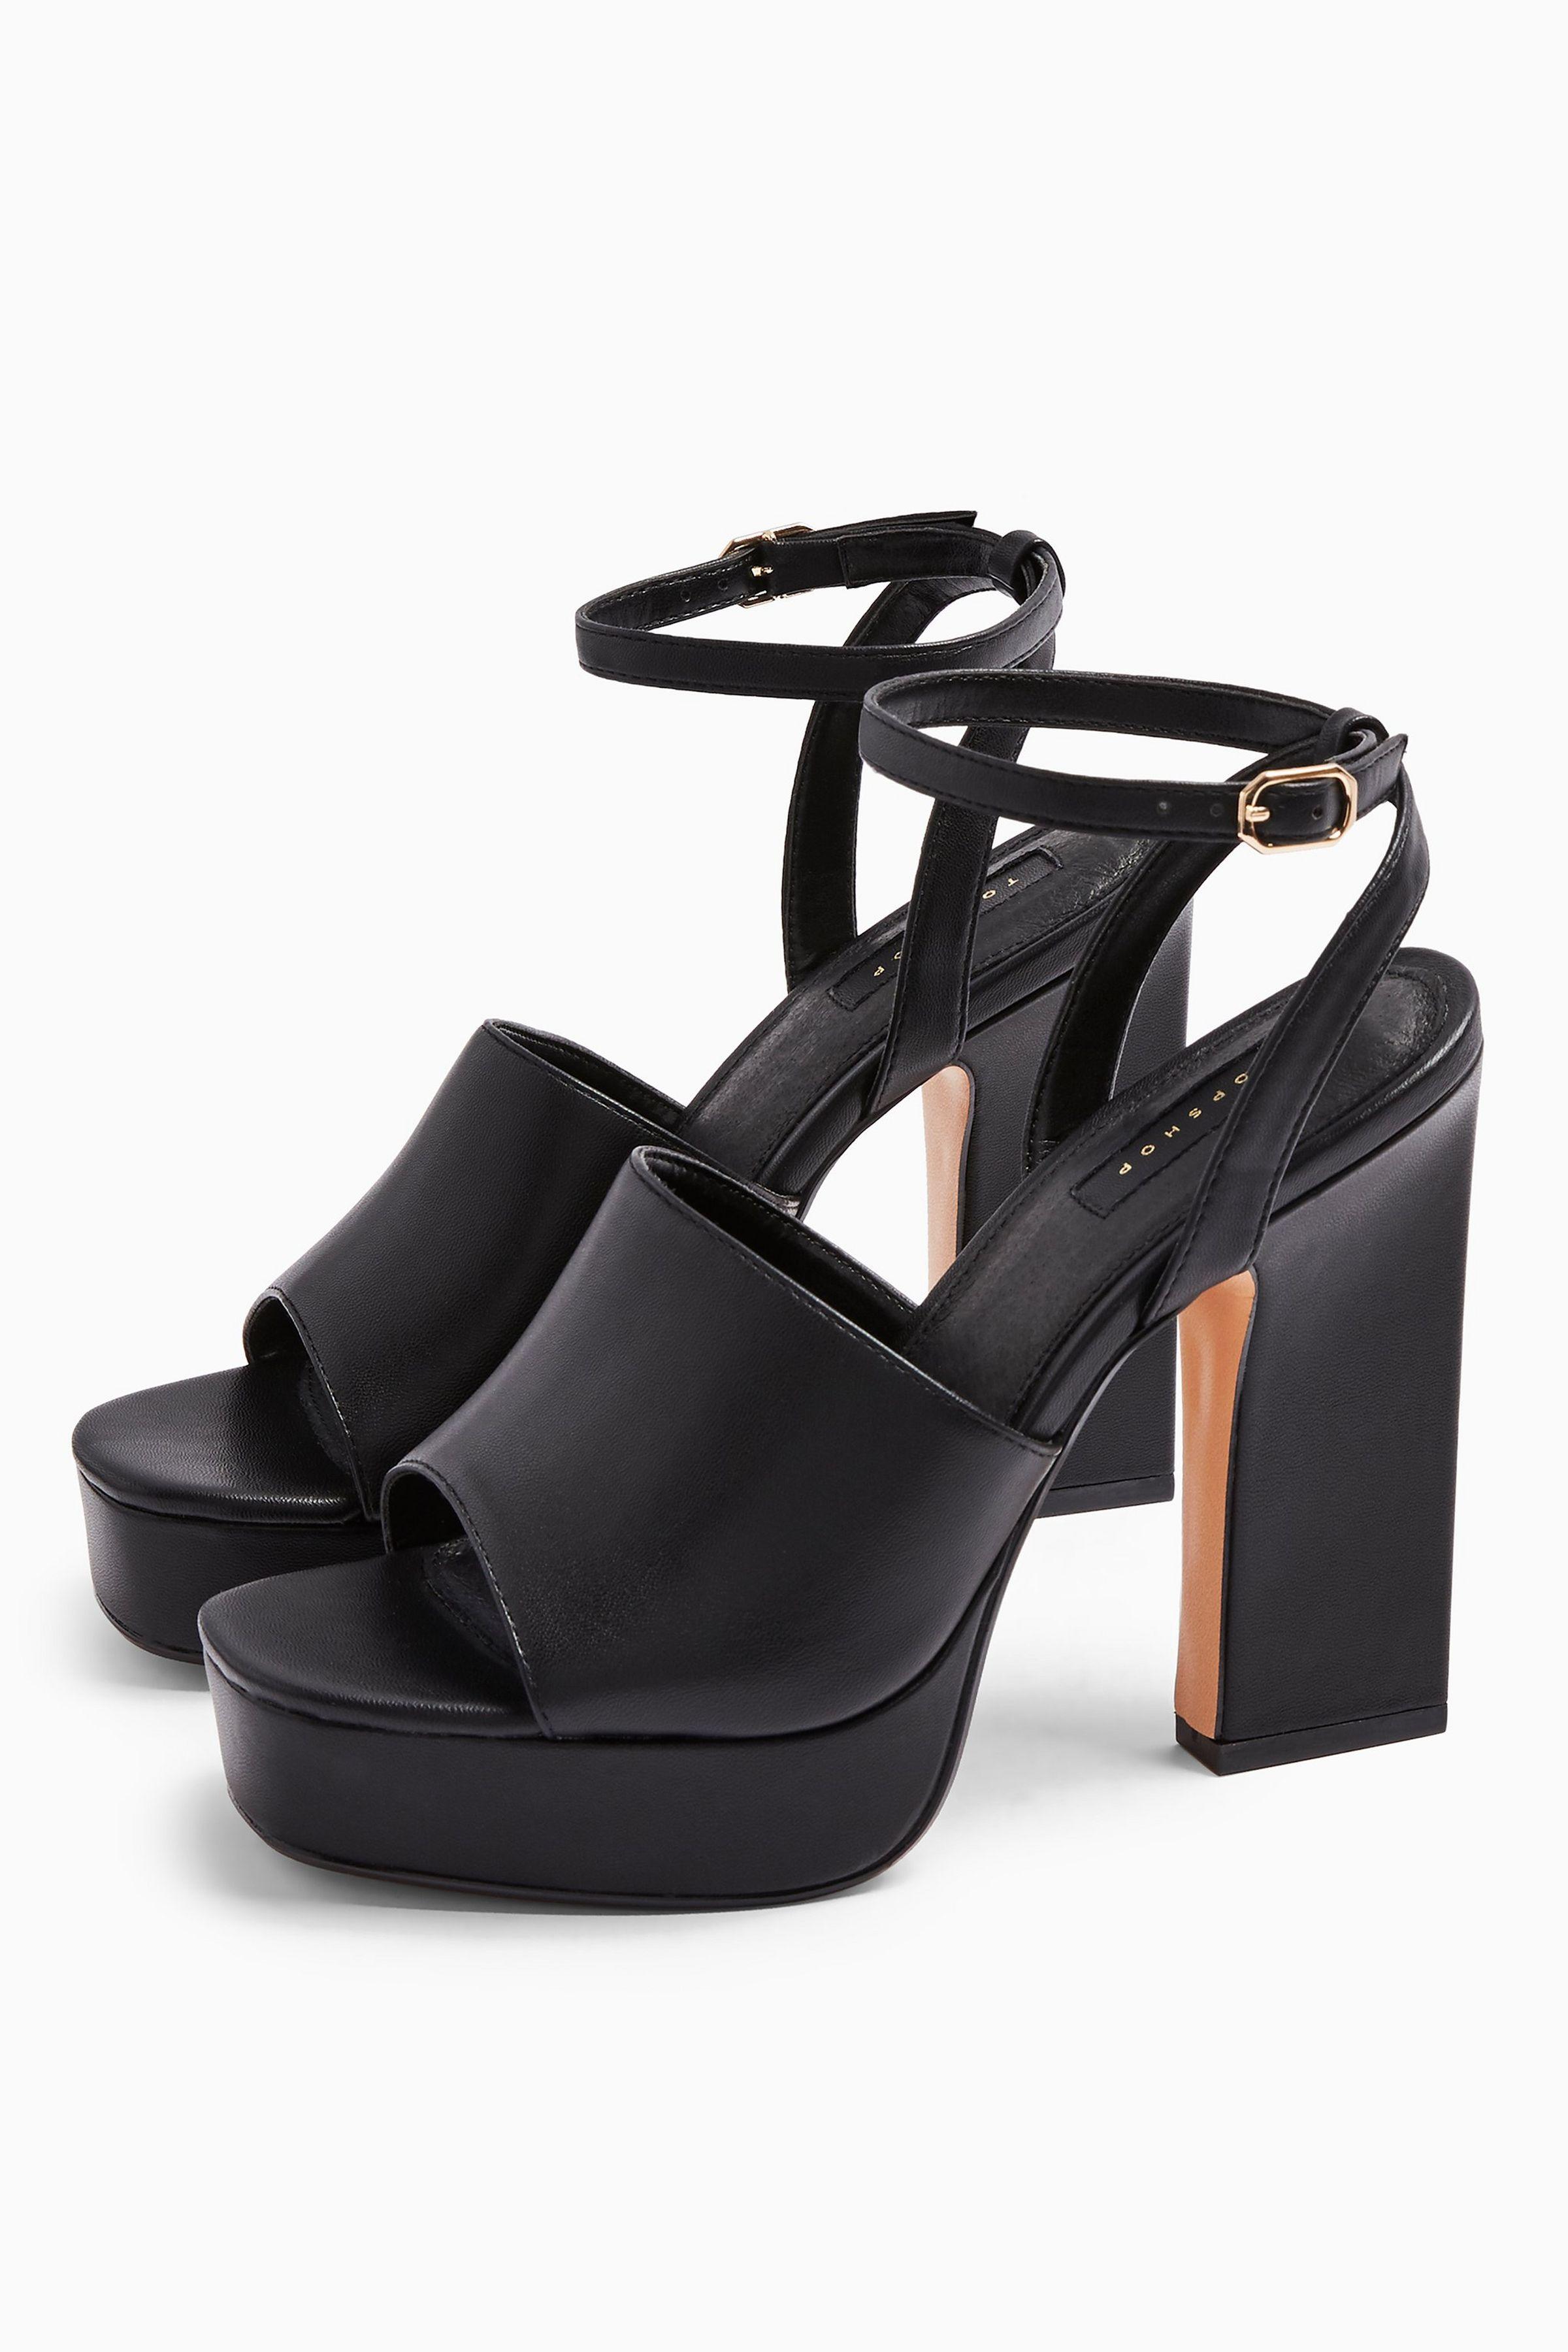 RAFA Chunky Platform Shoes | Topshop